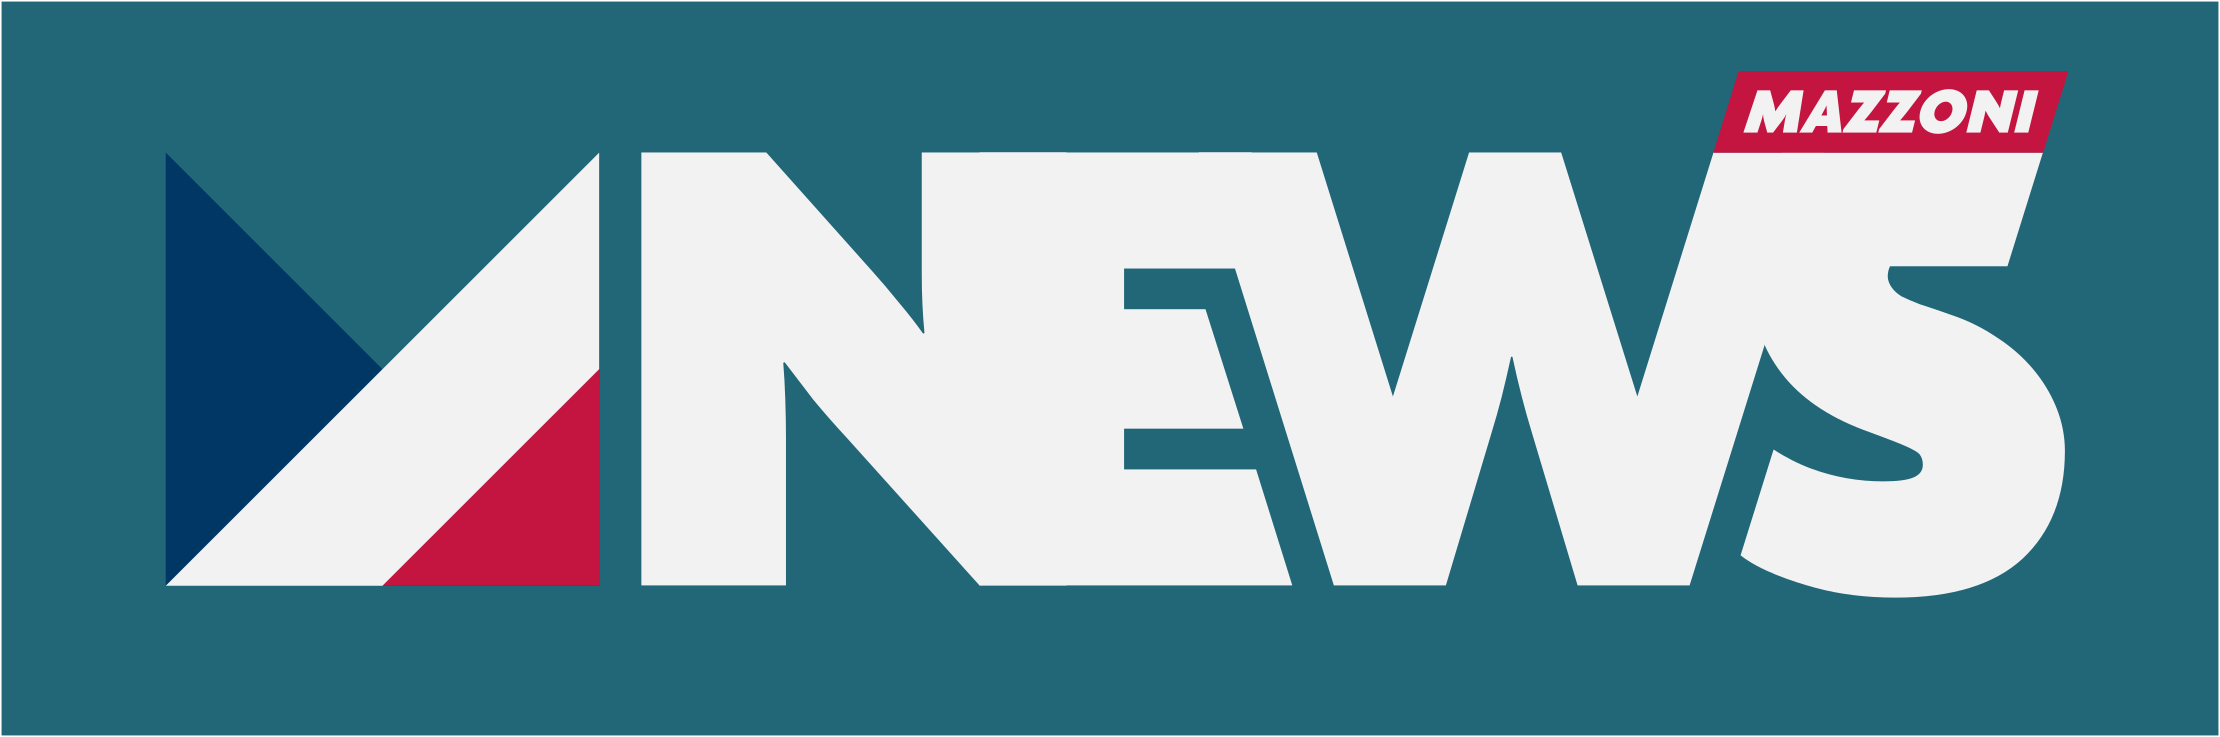 Mazzoni News